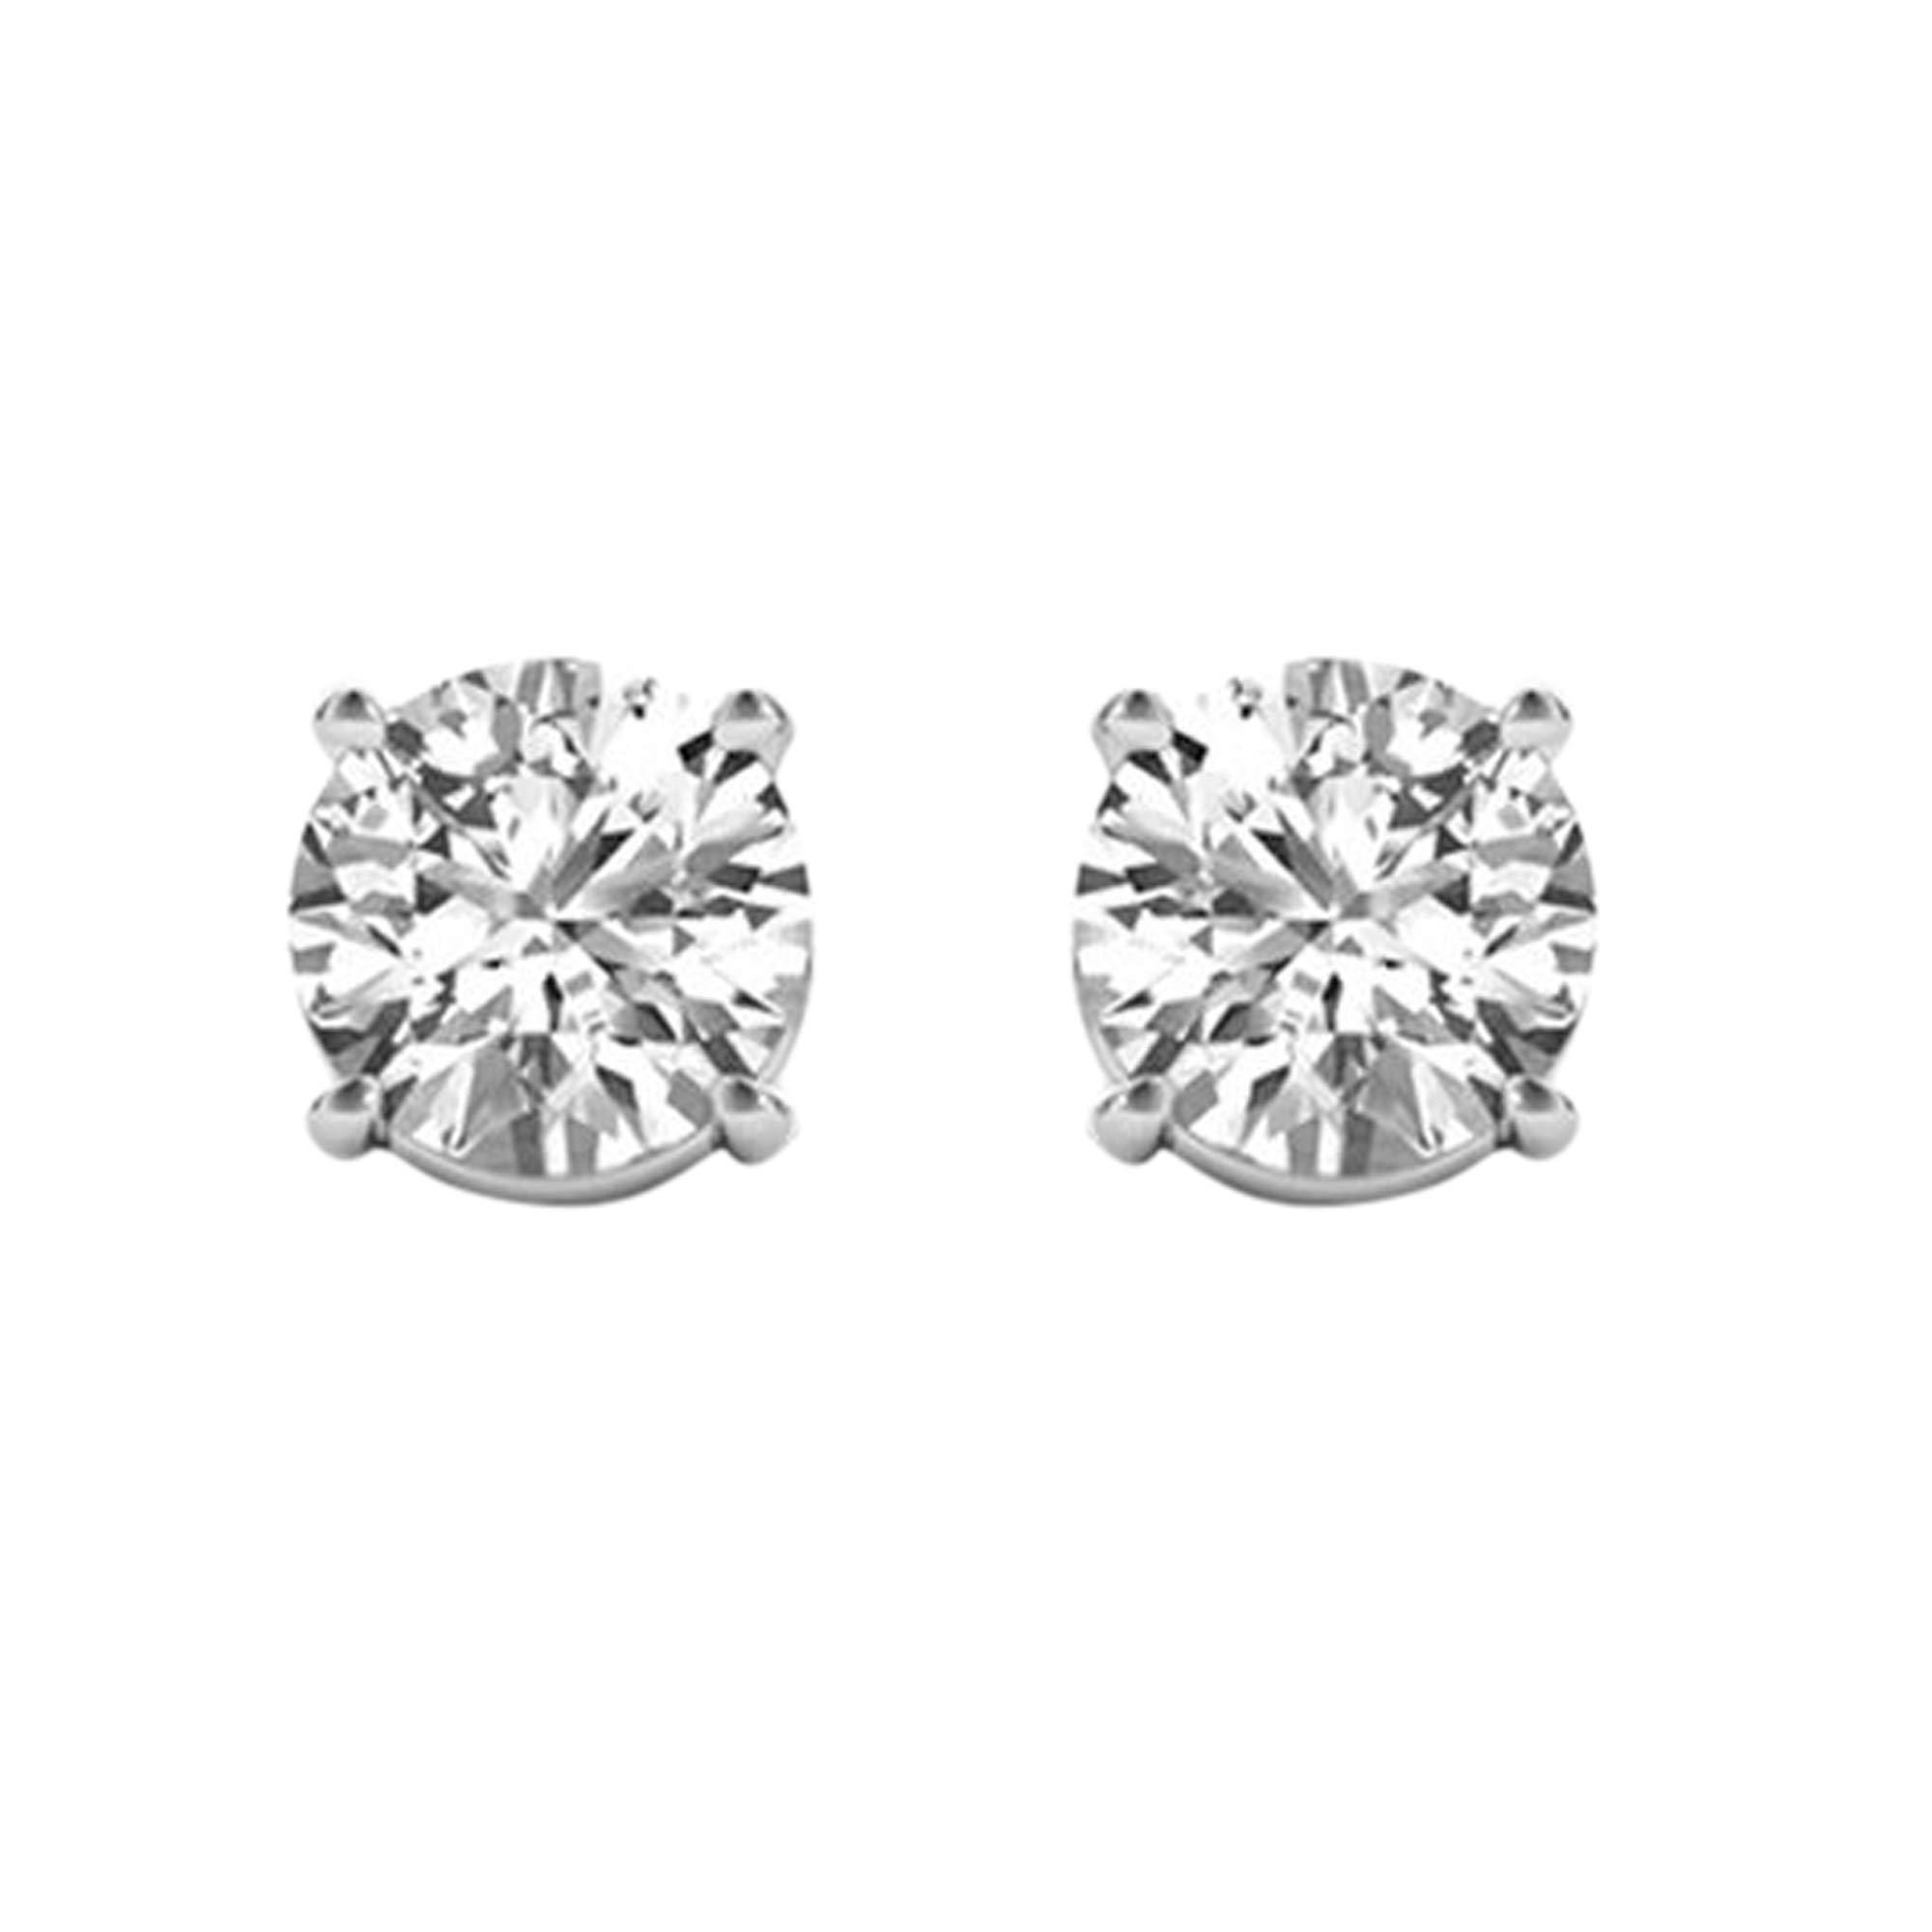 1ct Diamond Stud Earrings for Women in 14K Gold, (Clarity I2I3)